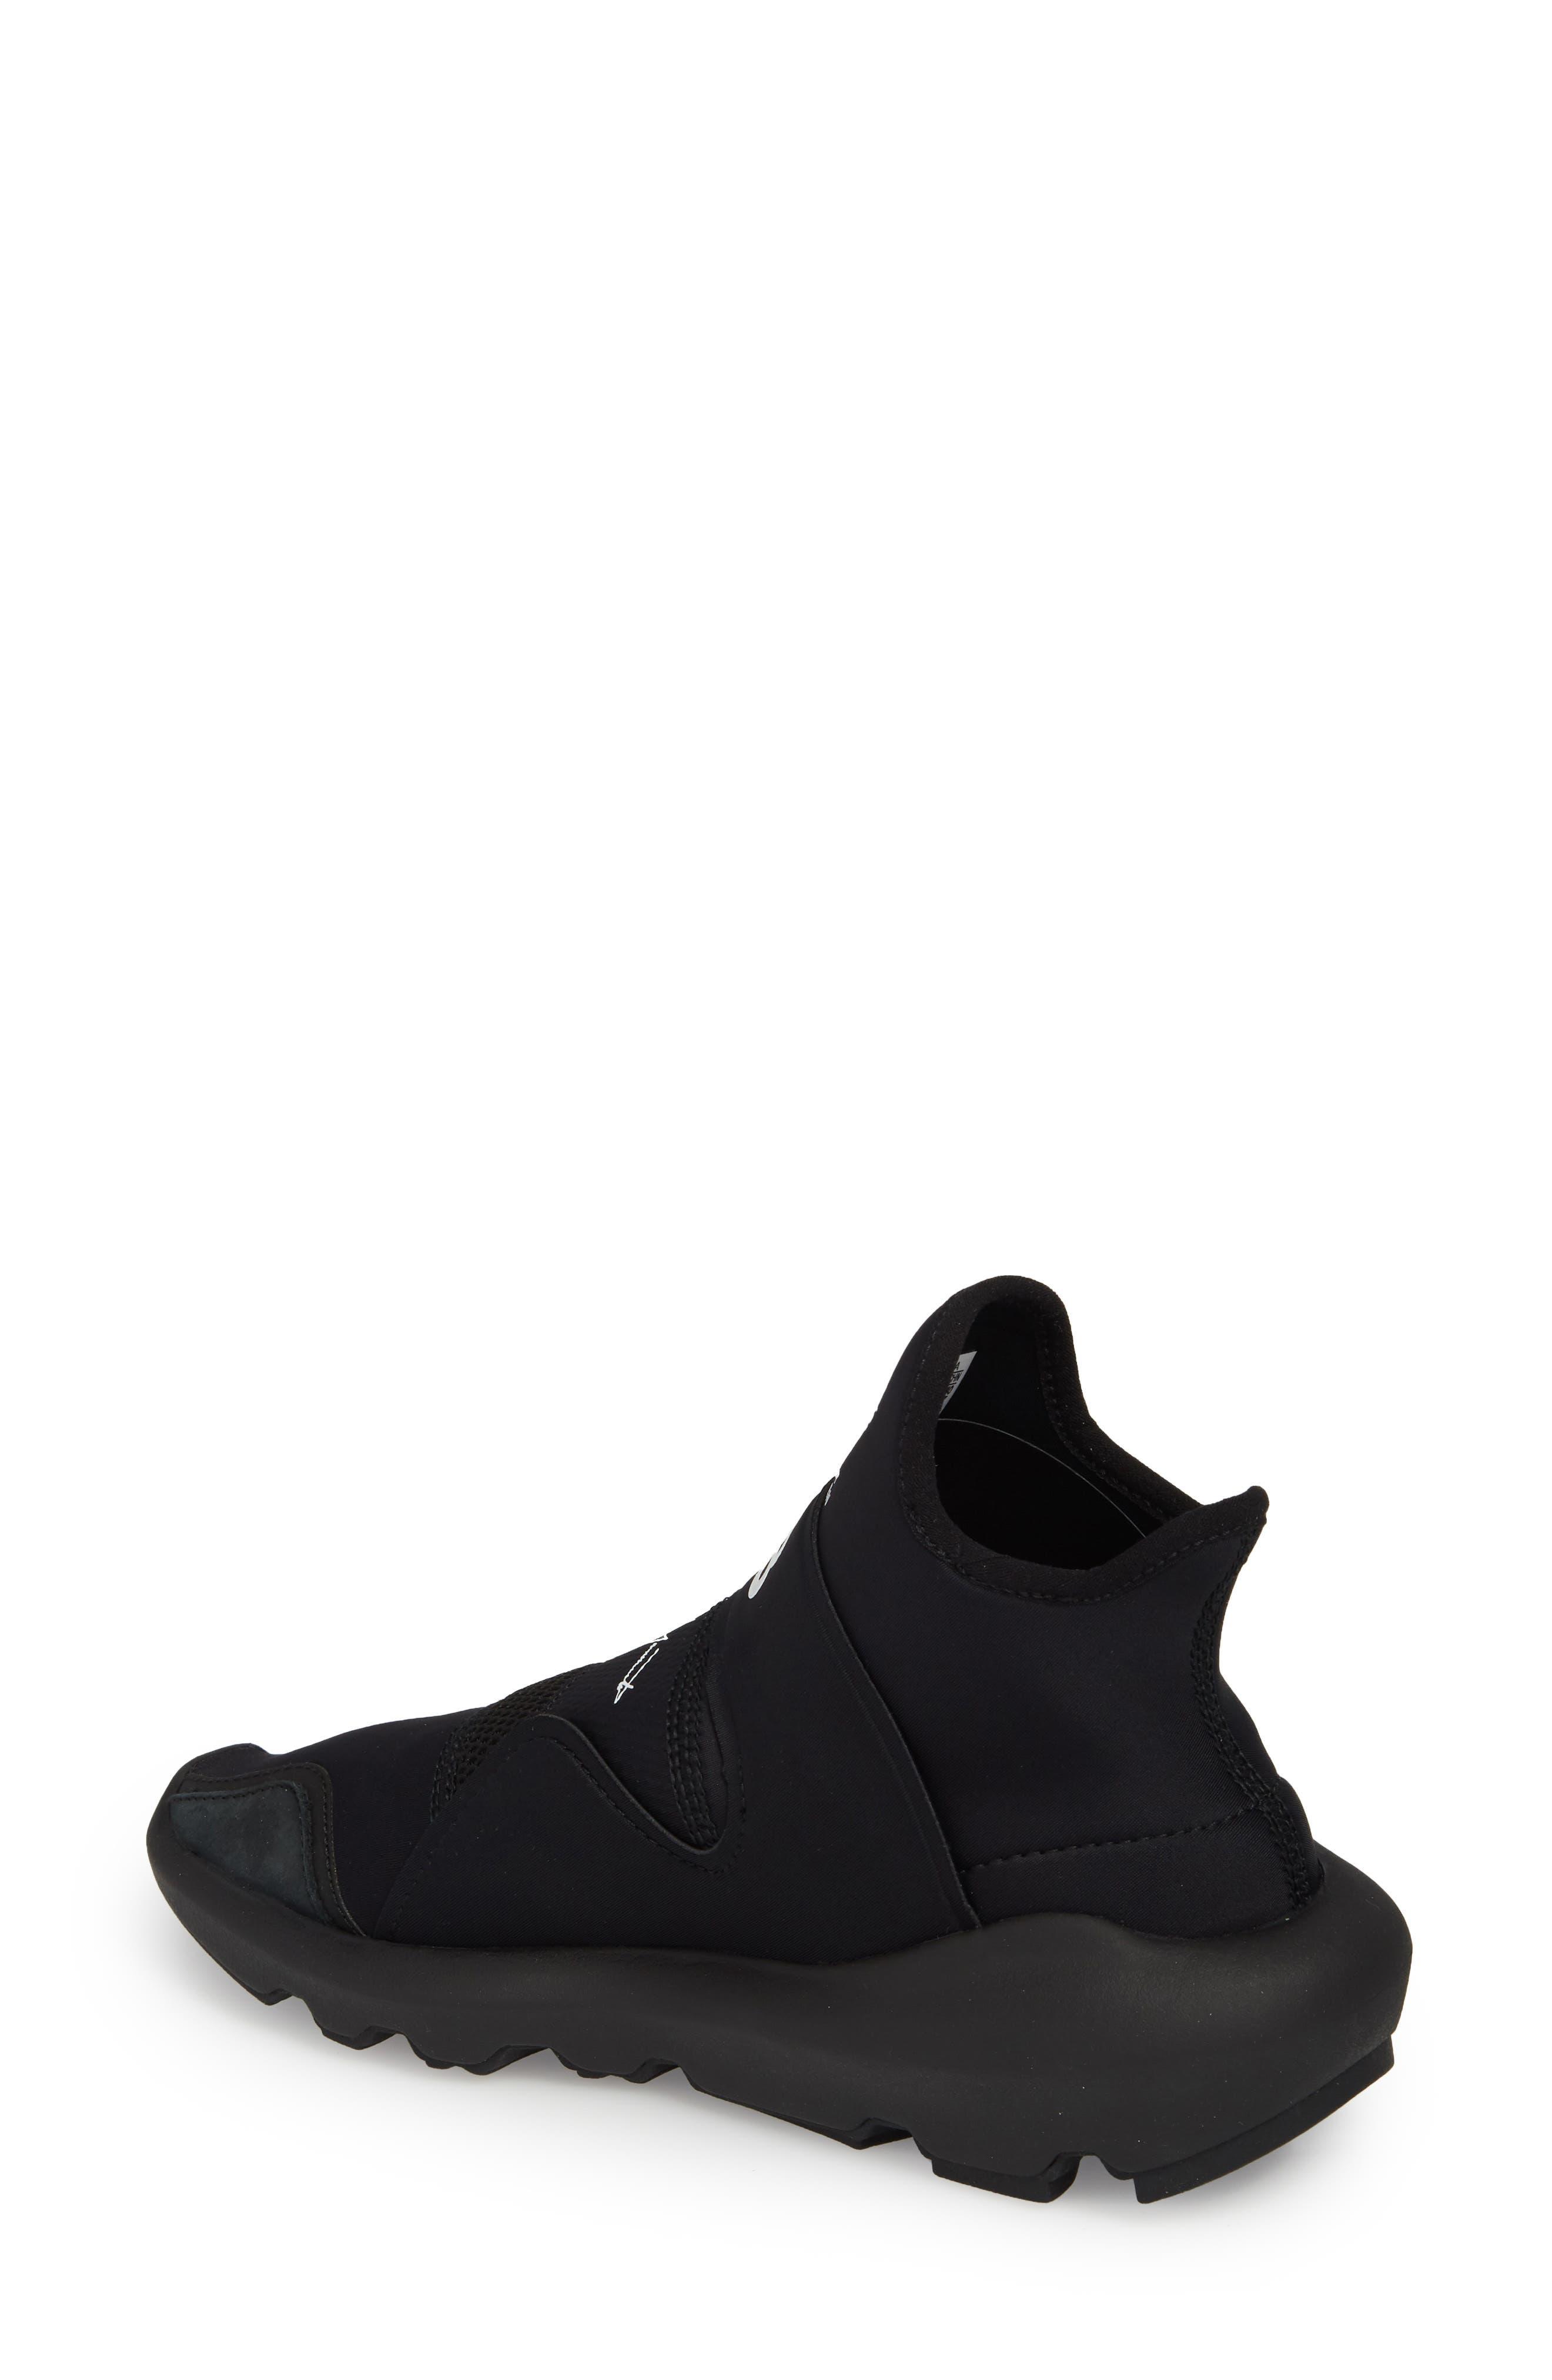 Superbou Sneaker,                             Alternate thumbnail 4, color,